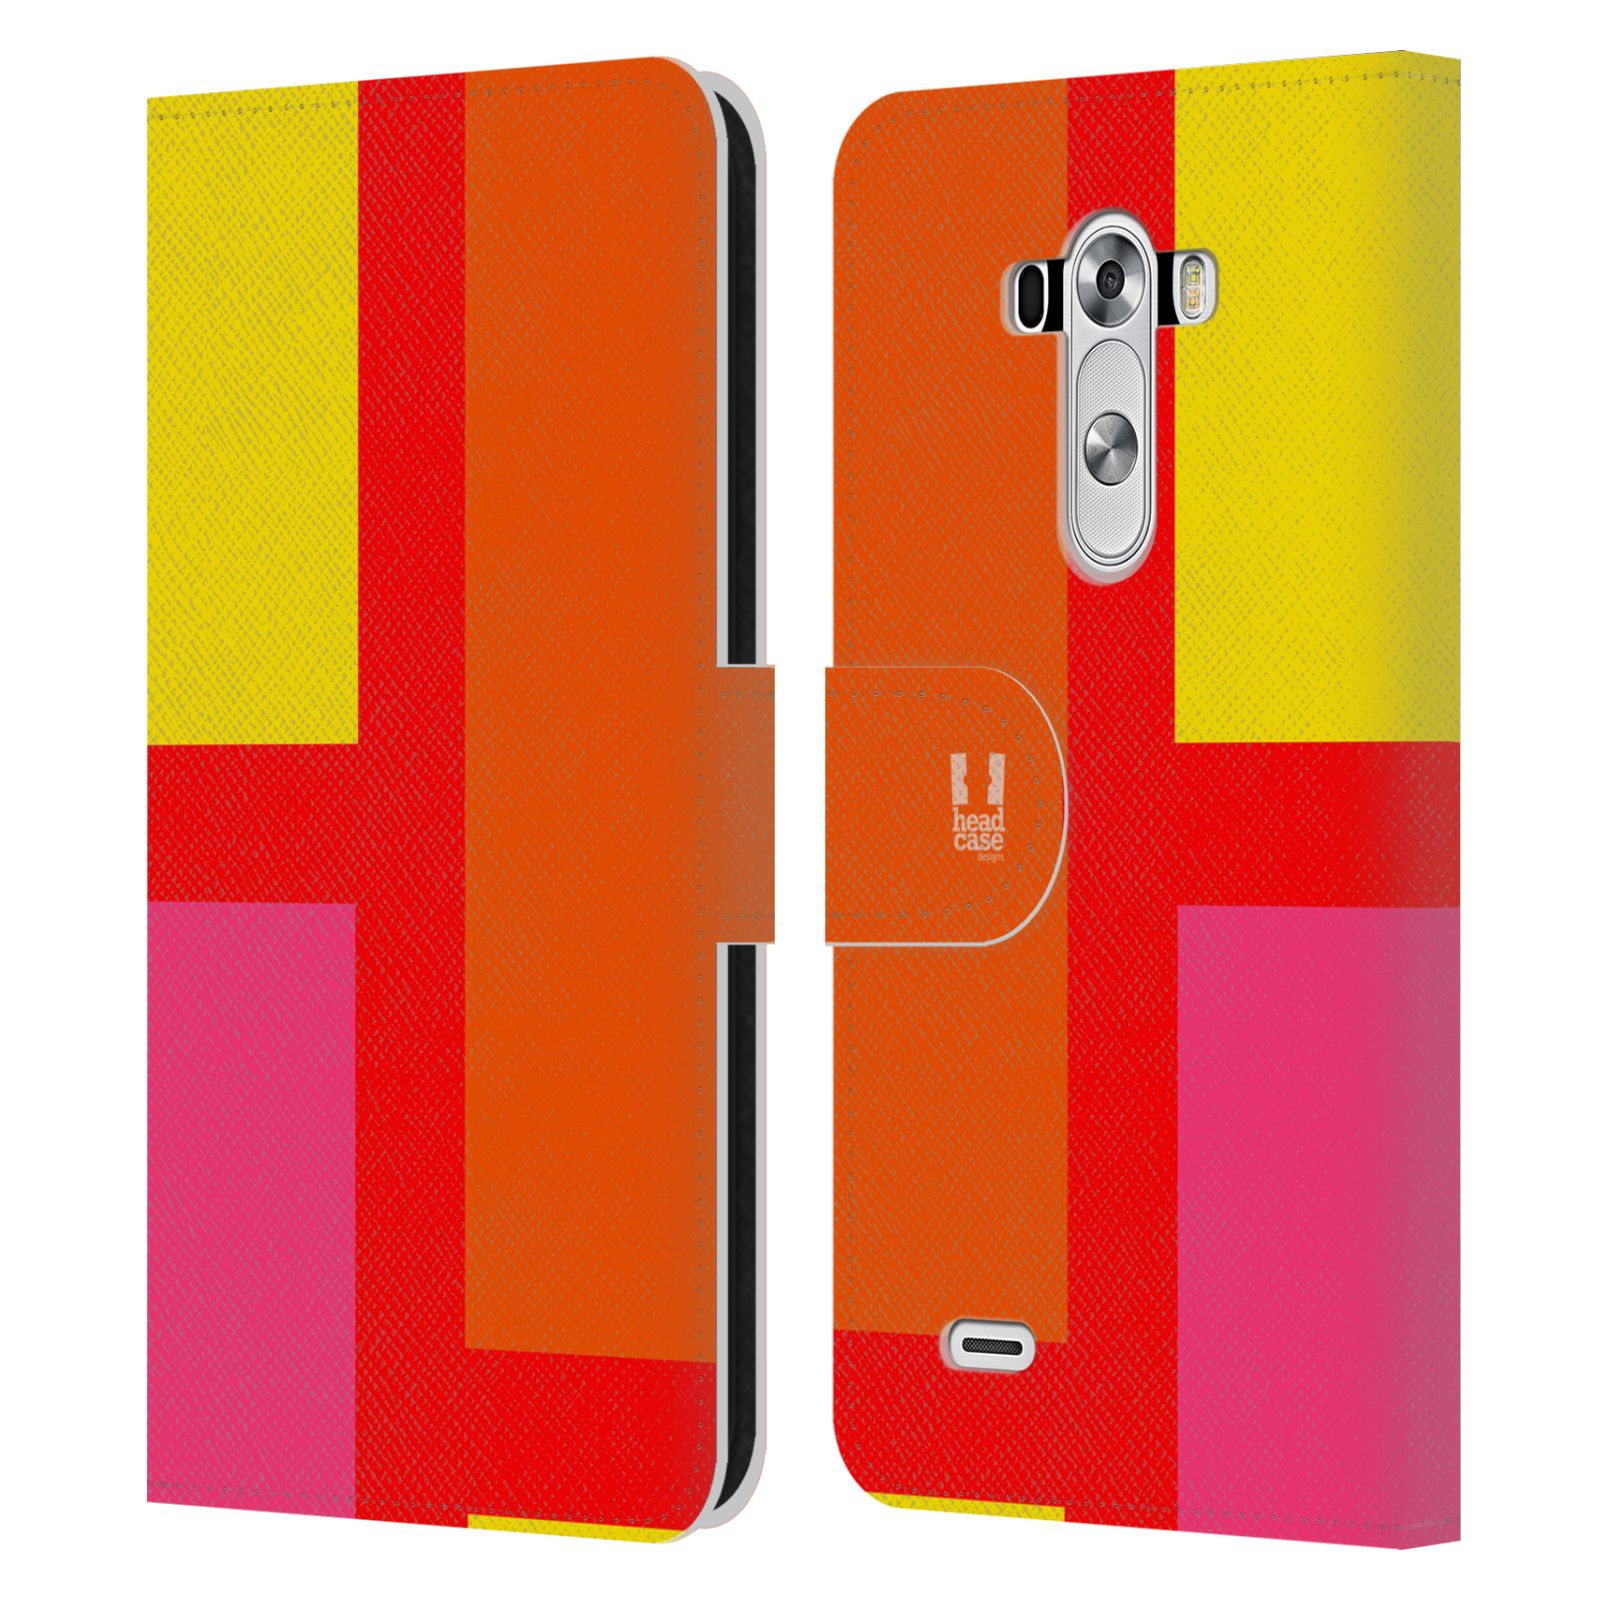 HEAD CASE Flipové pouzdro pro mobil LG G3 barevné tvary oranžová ulice